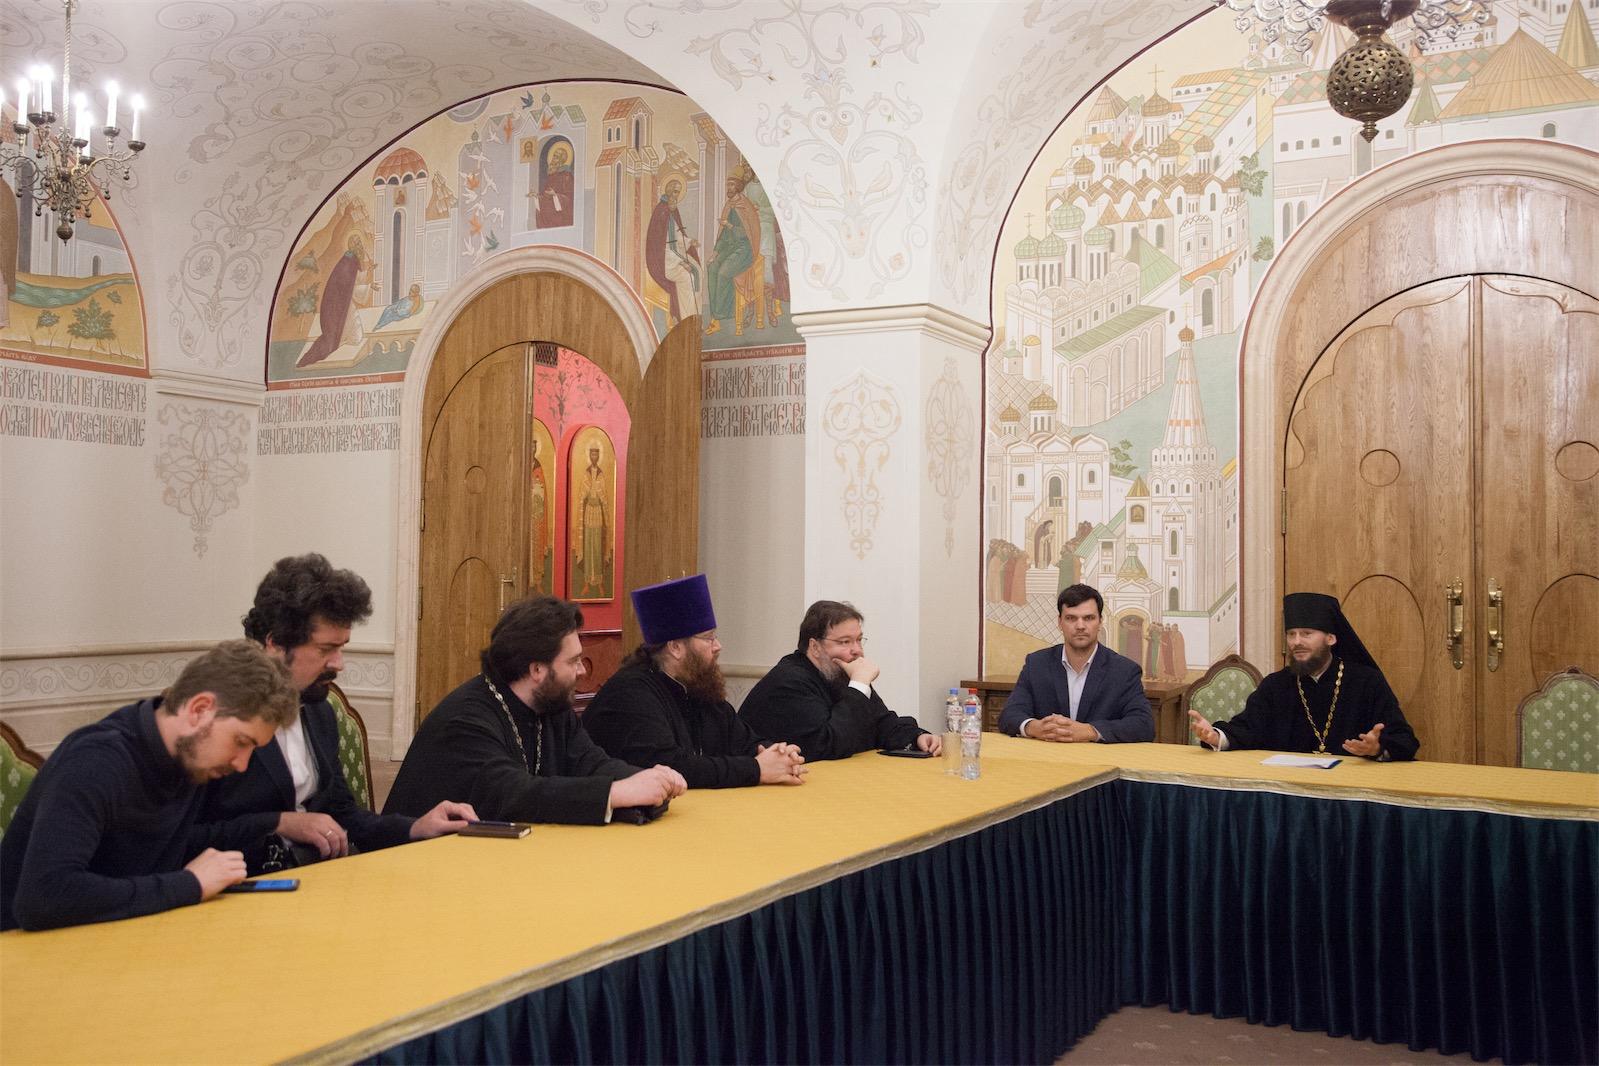 https://pravoslavie.ru/sas/image/103257/325720.b.jpg